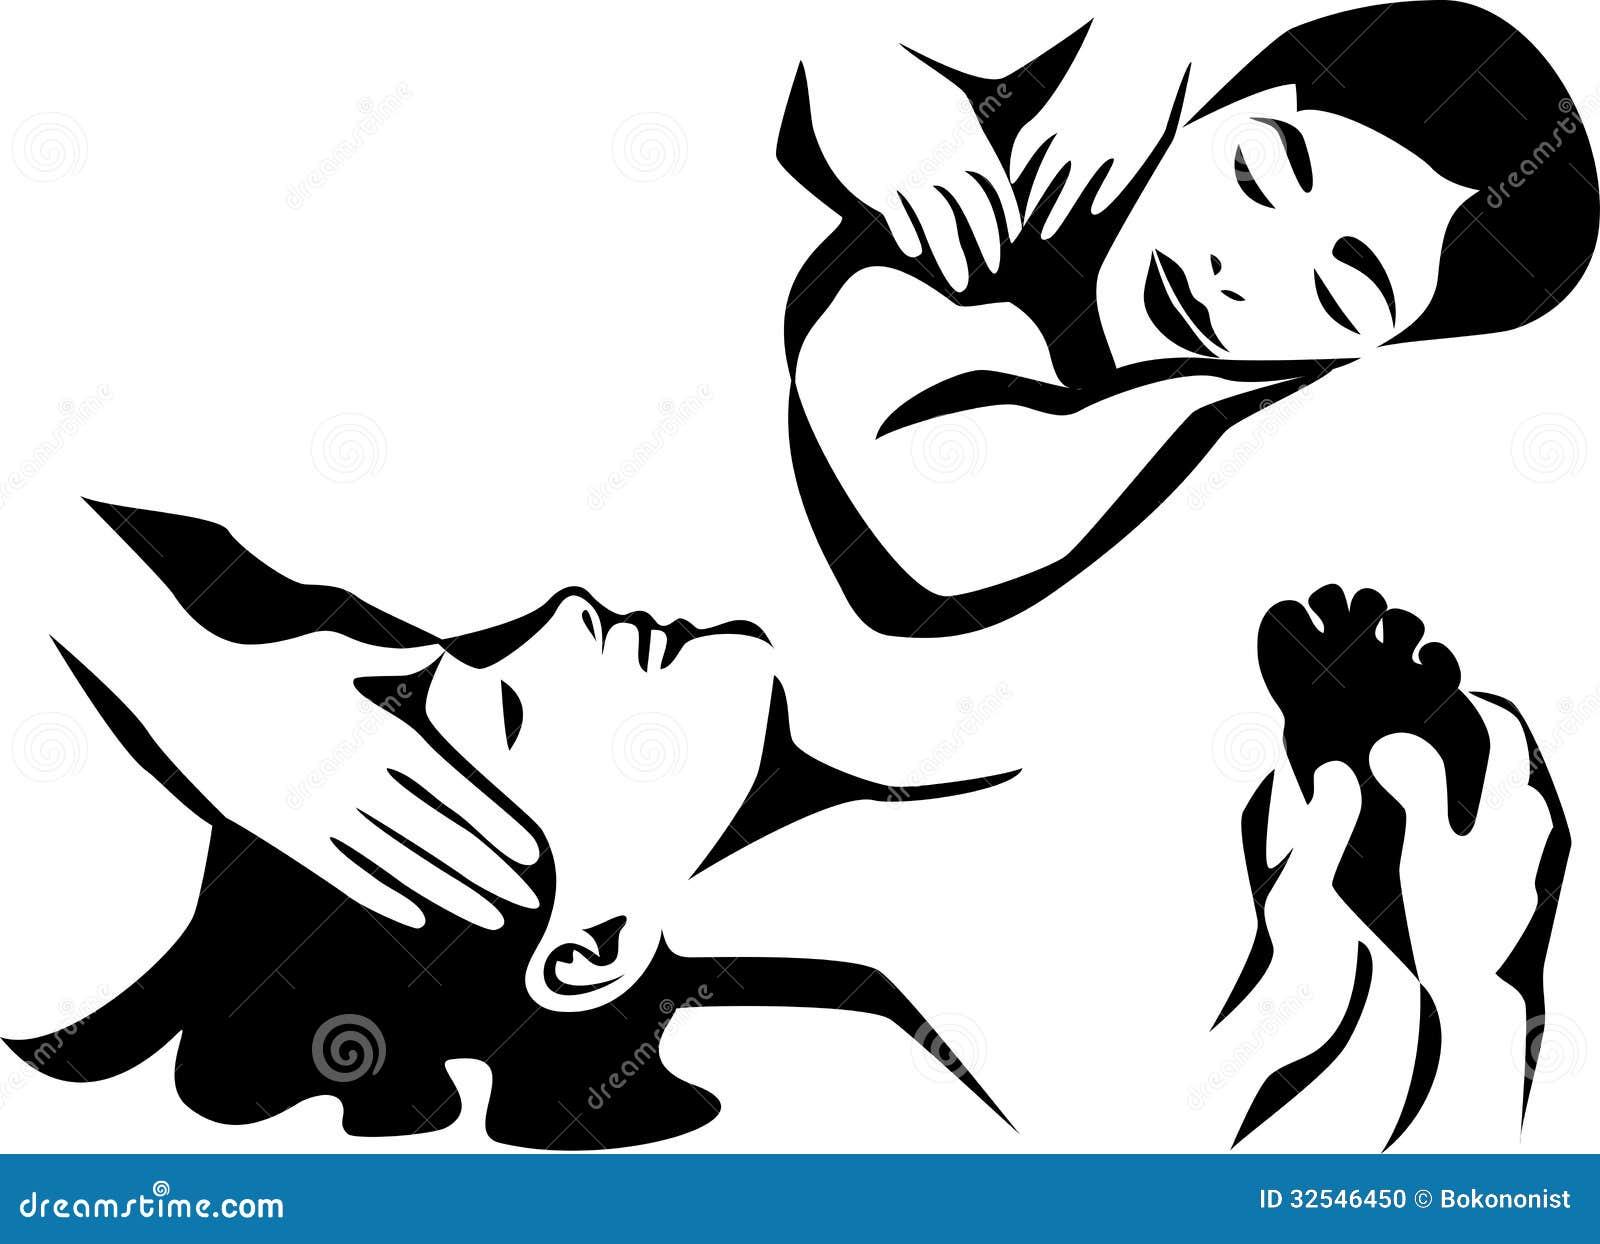 Картинка массажиста